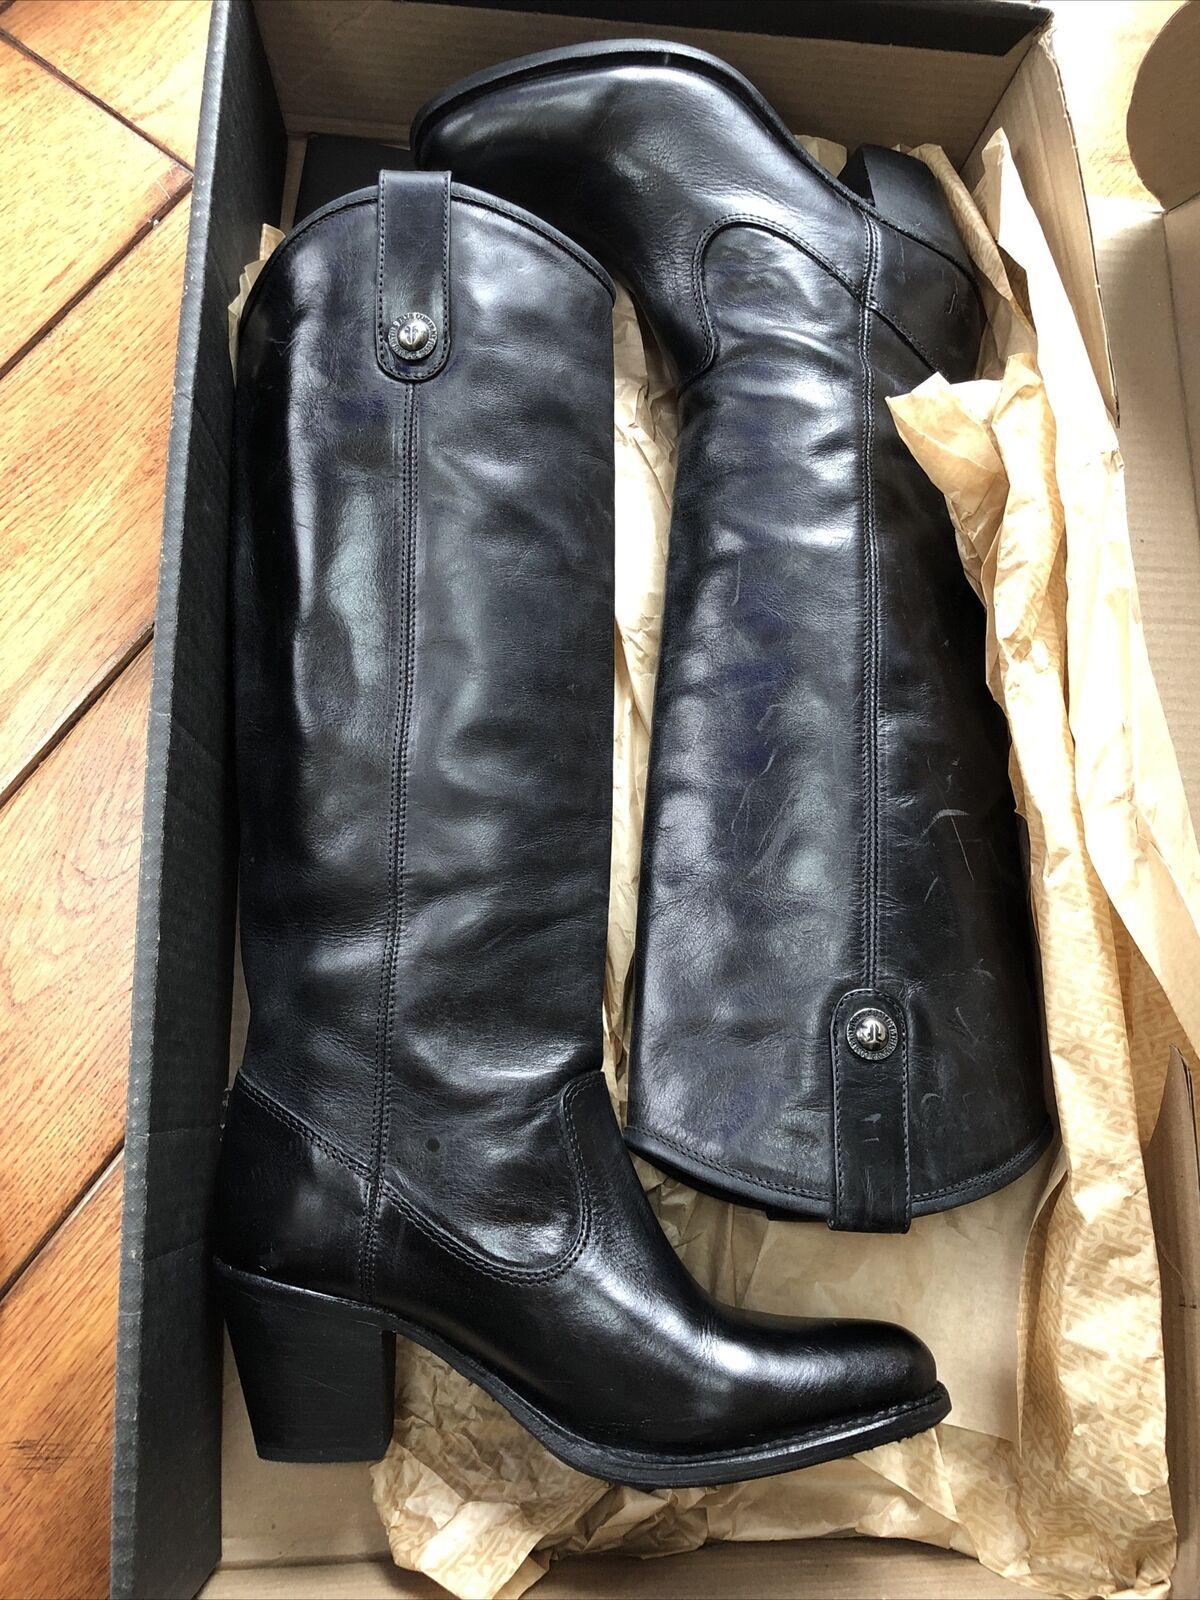 frye jackie button boots Black 8.5 NIB leather Slip On